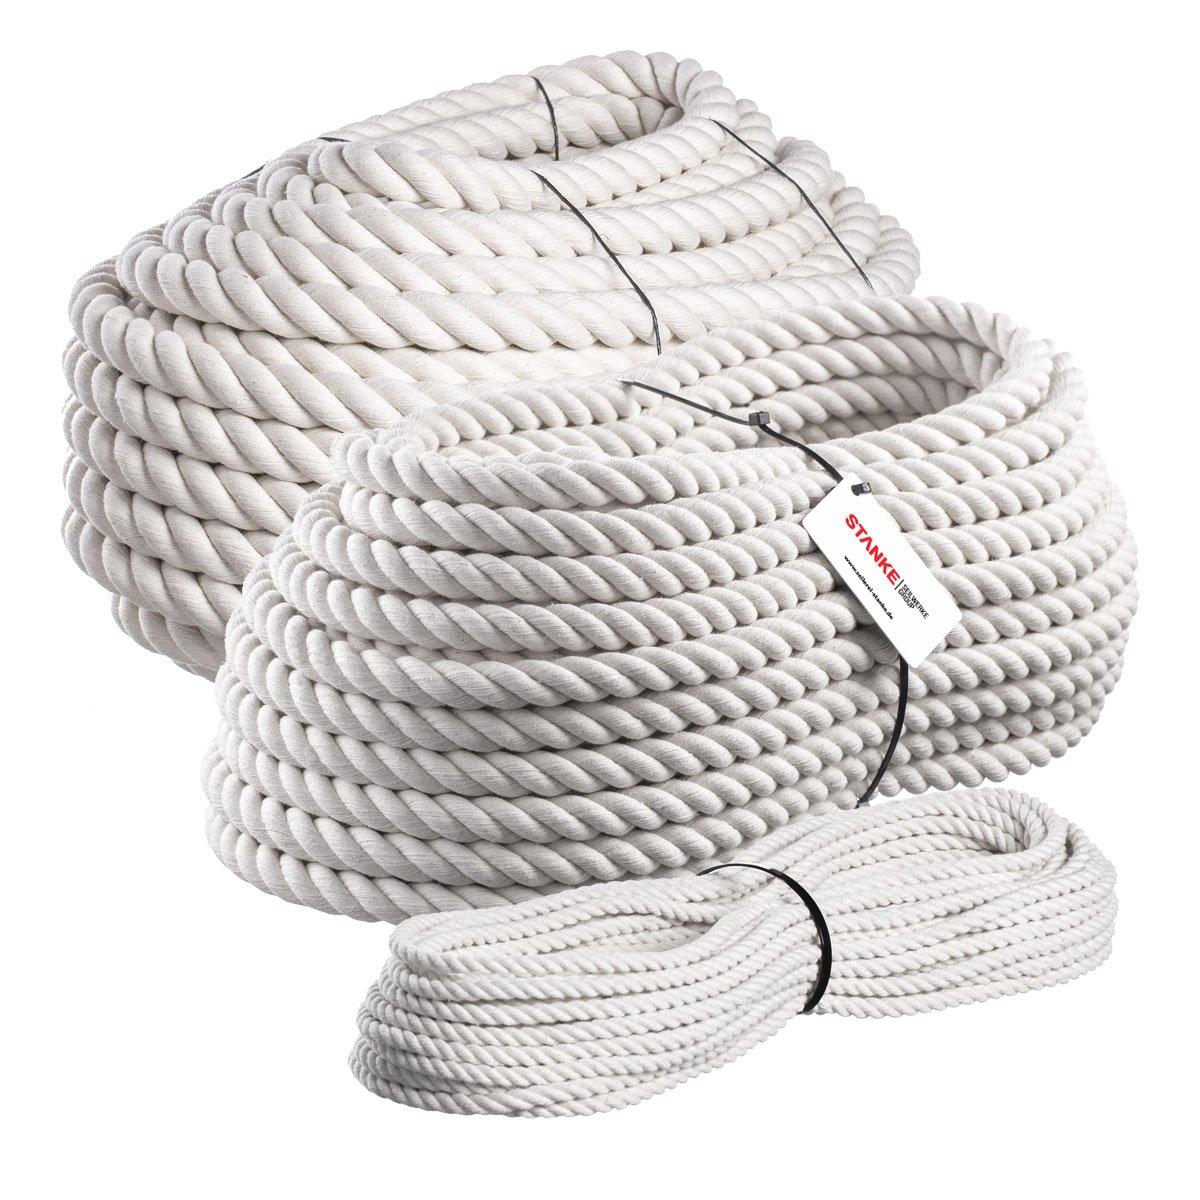 Seilwerk STANKE 50 m Cuerda de algodó n 8 mm fibras naturales rizada aparejo